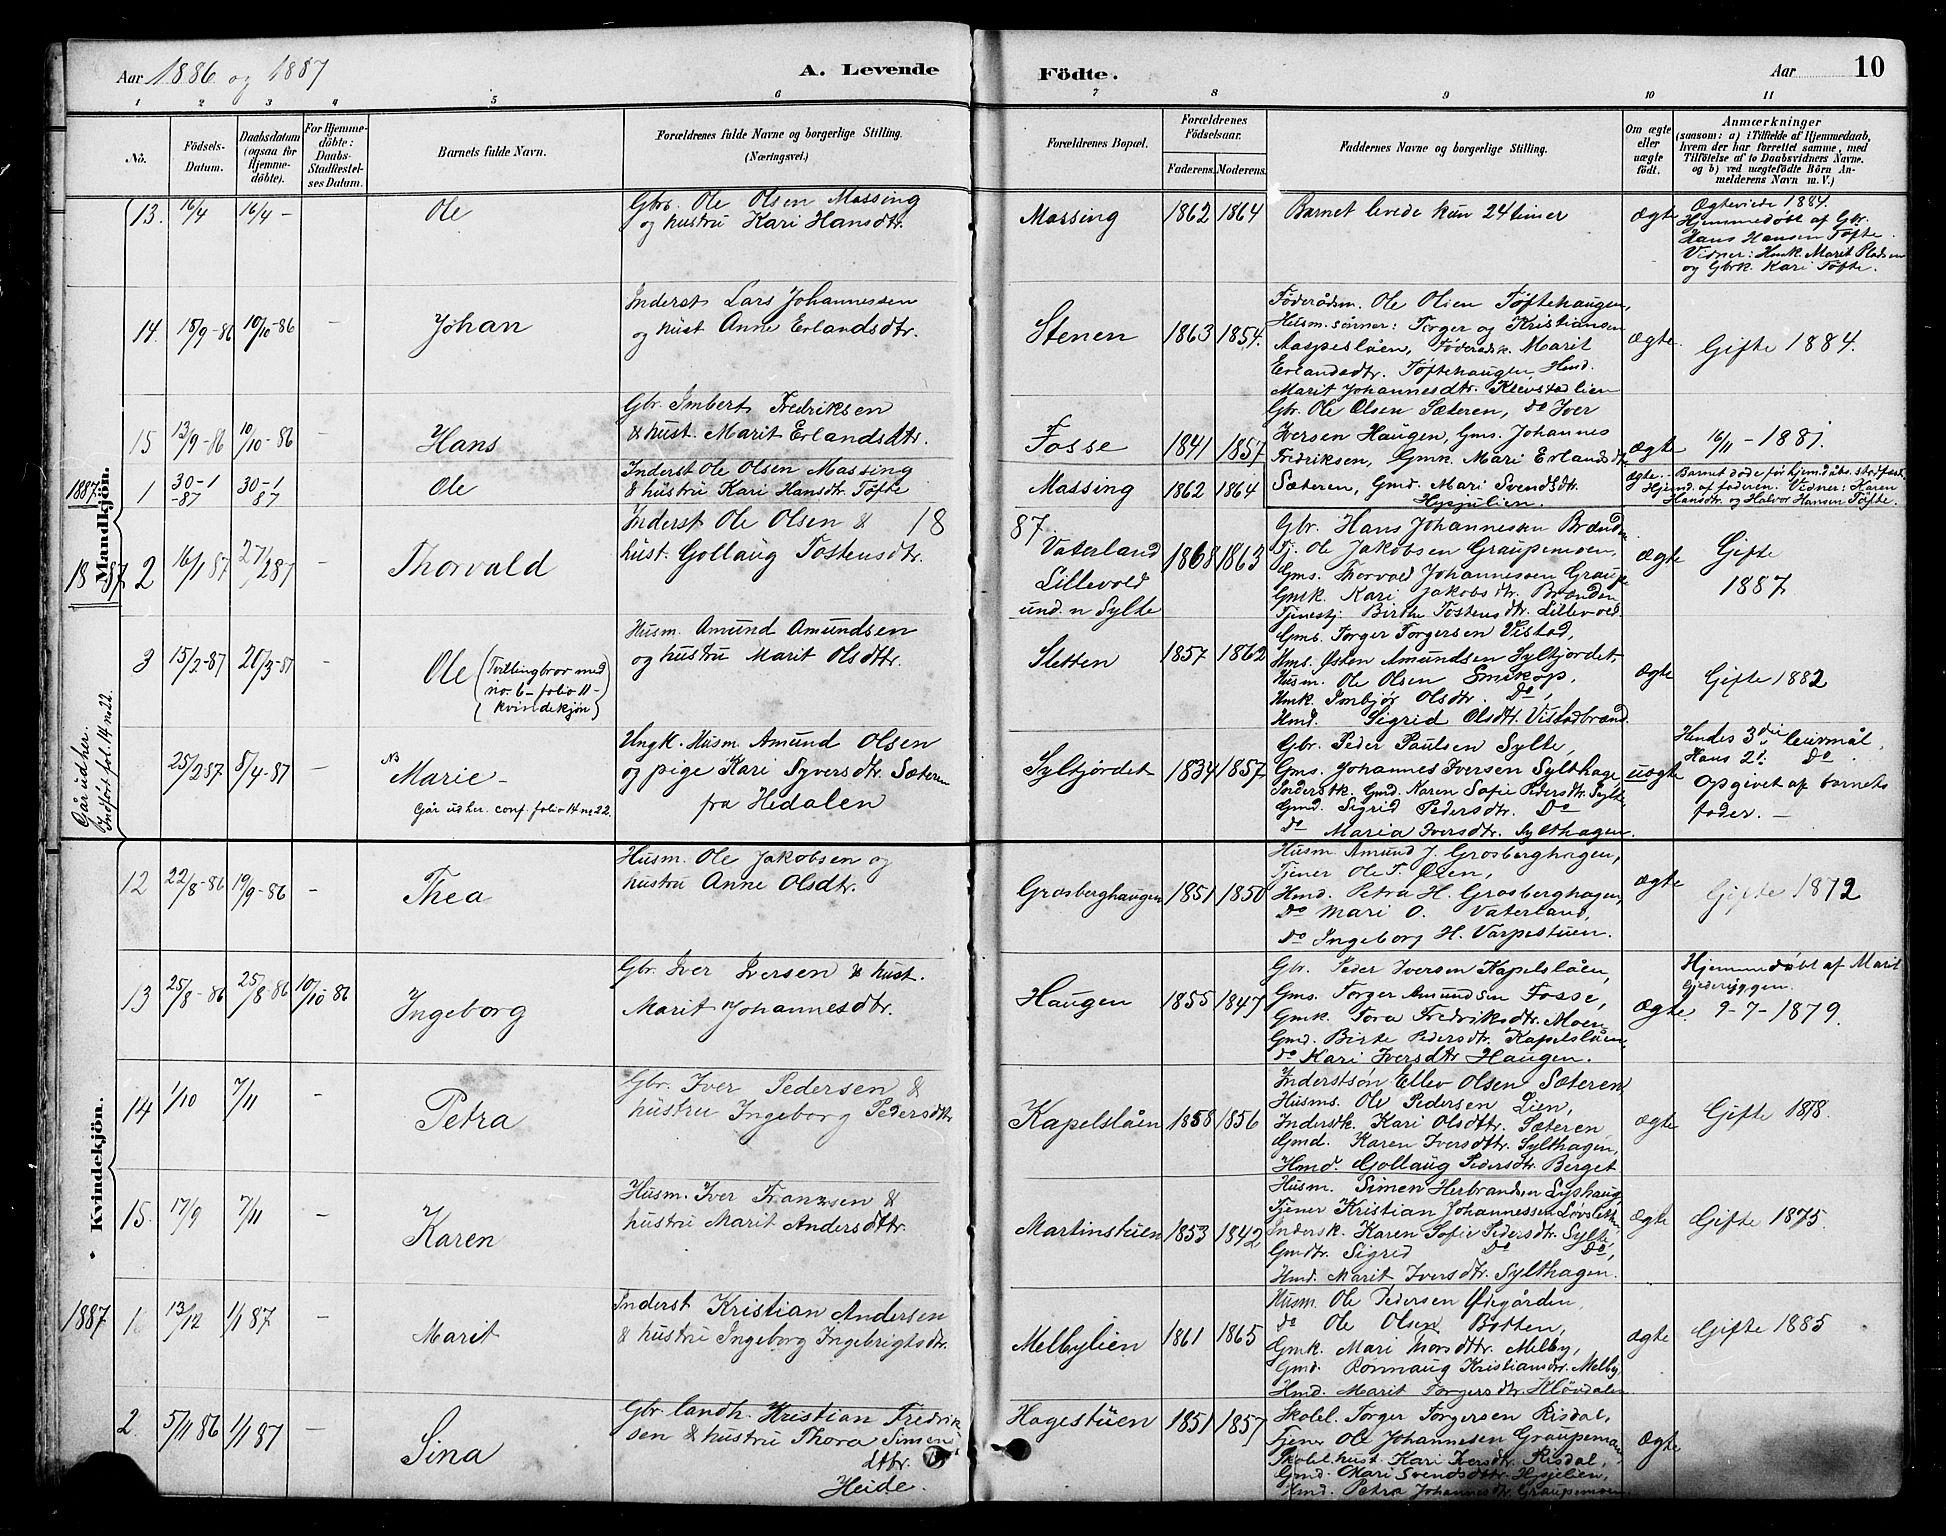 SAH, Nord-Fron prestekontor, Klokkerbok nr. 5, 1884-1914, s. 10